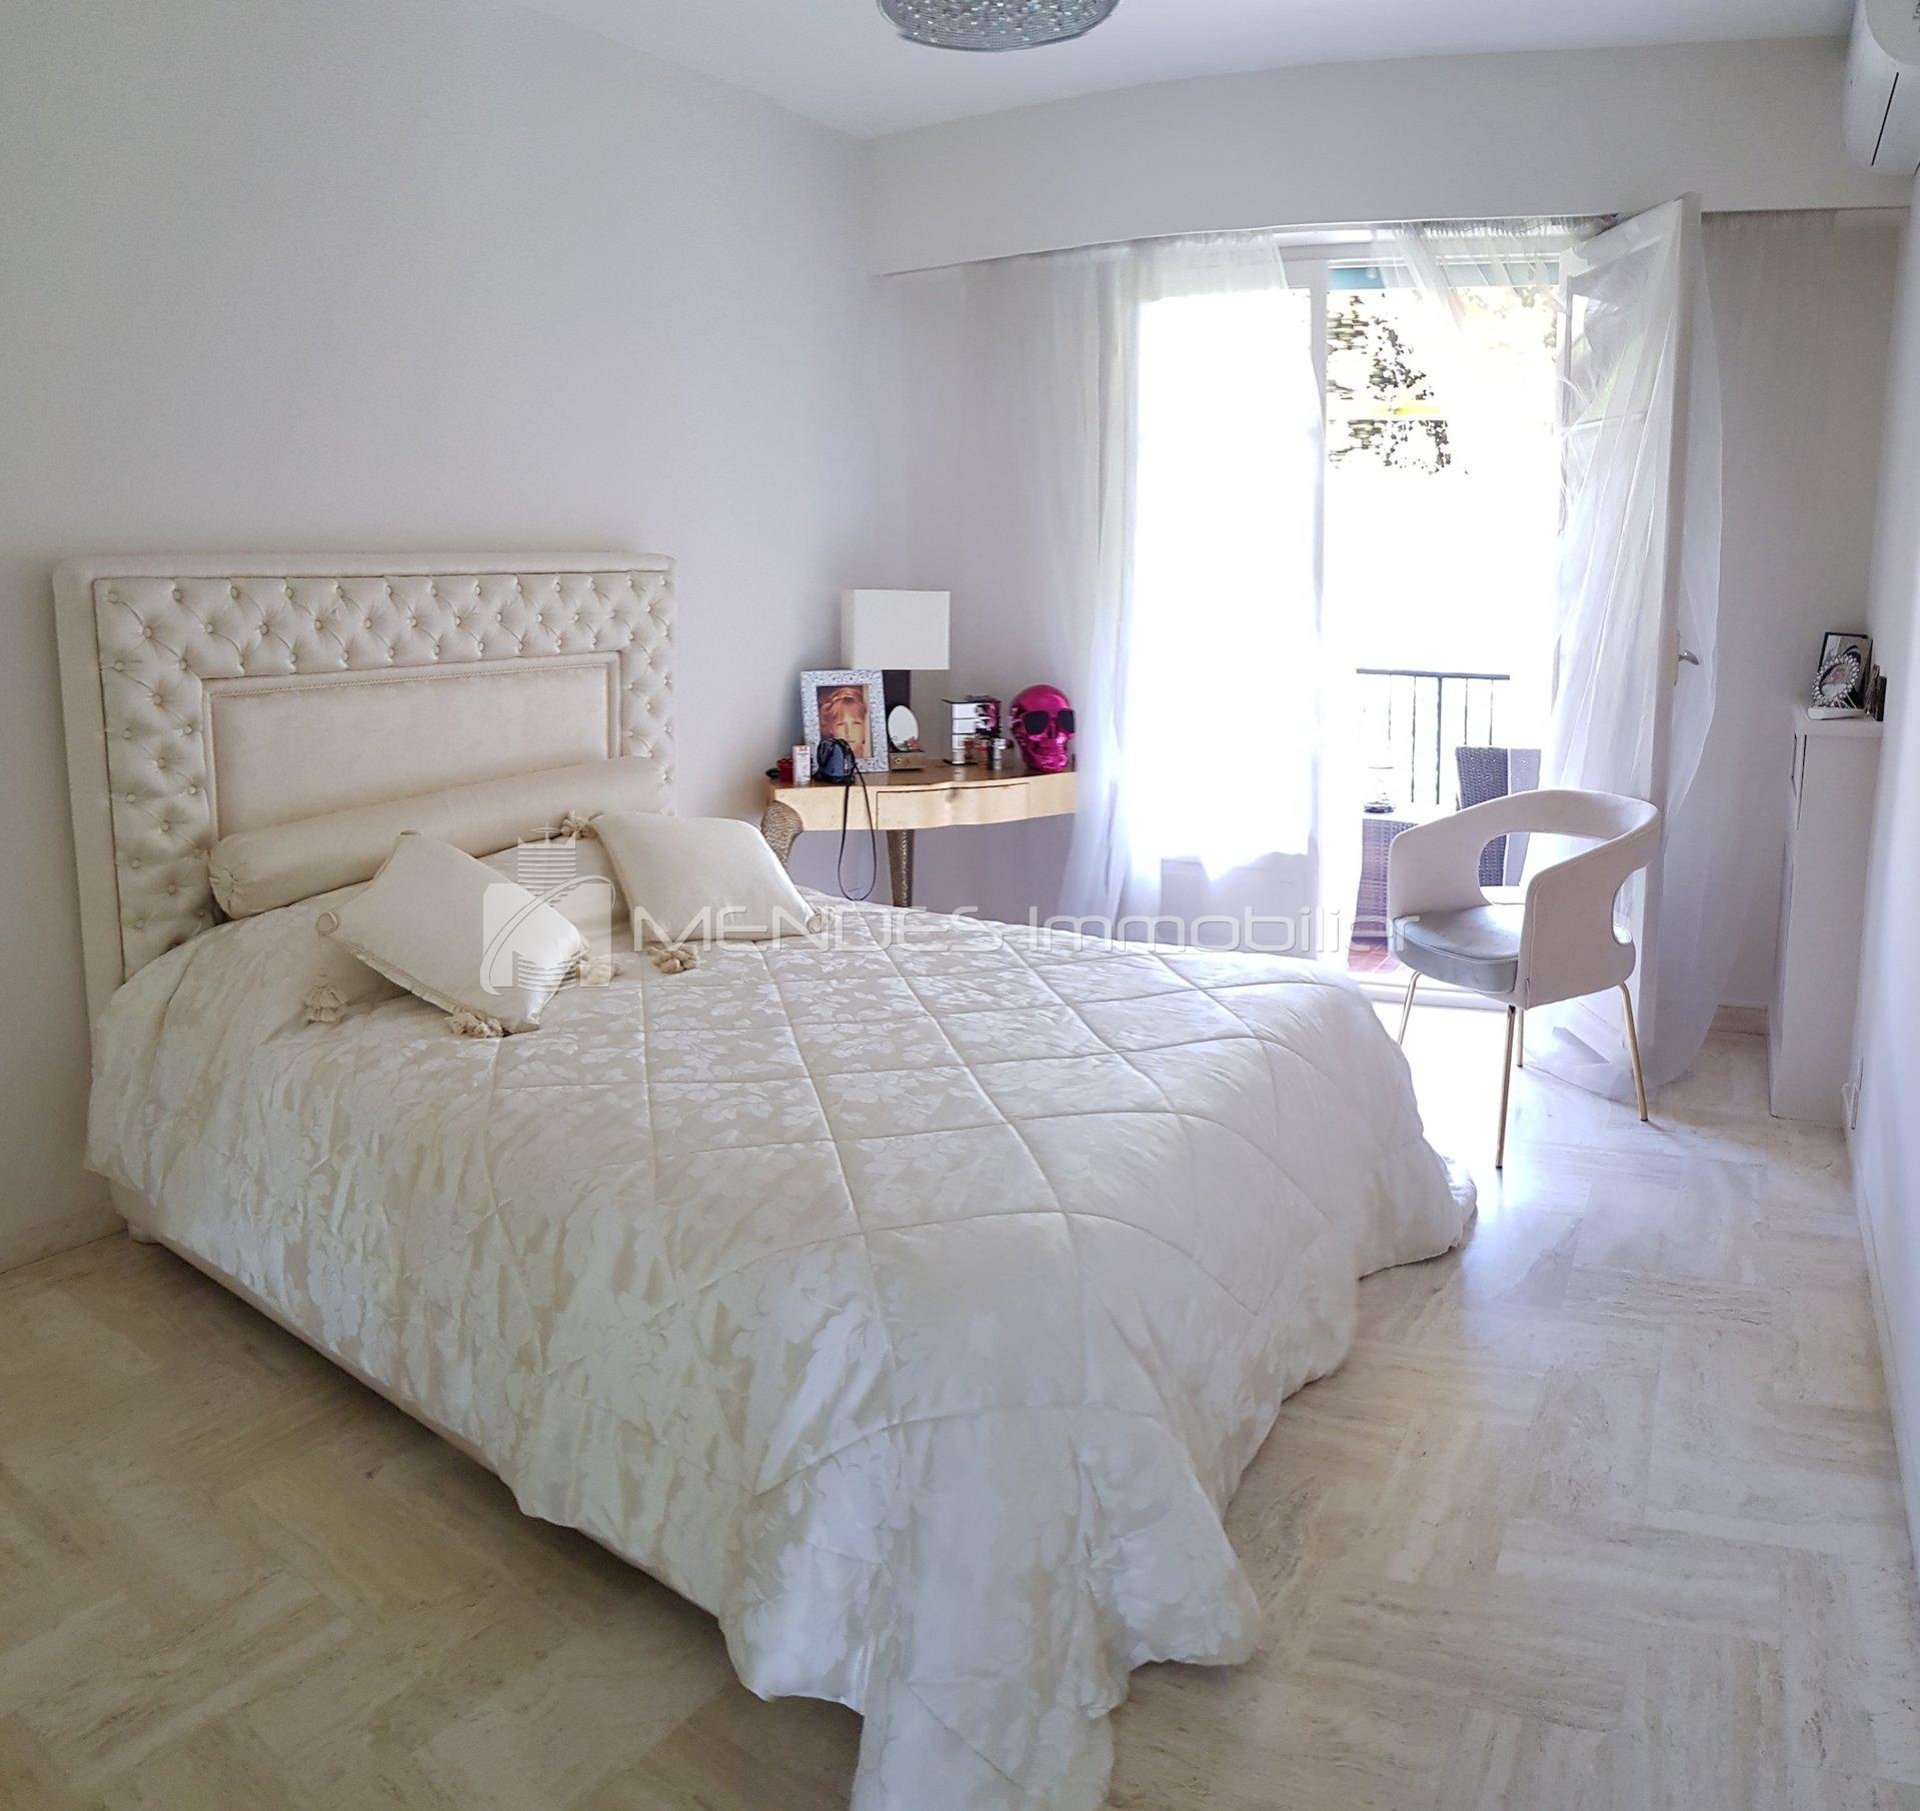 Affitto Appartamento - Cap-d'Ail